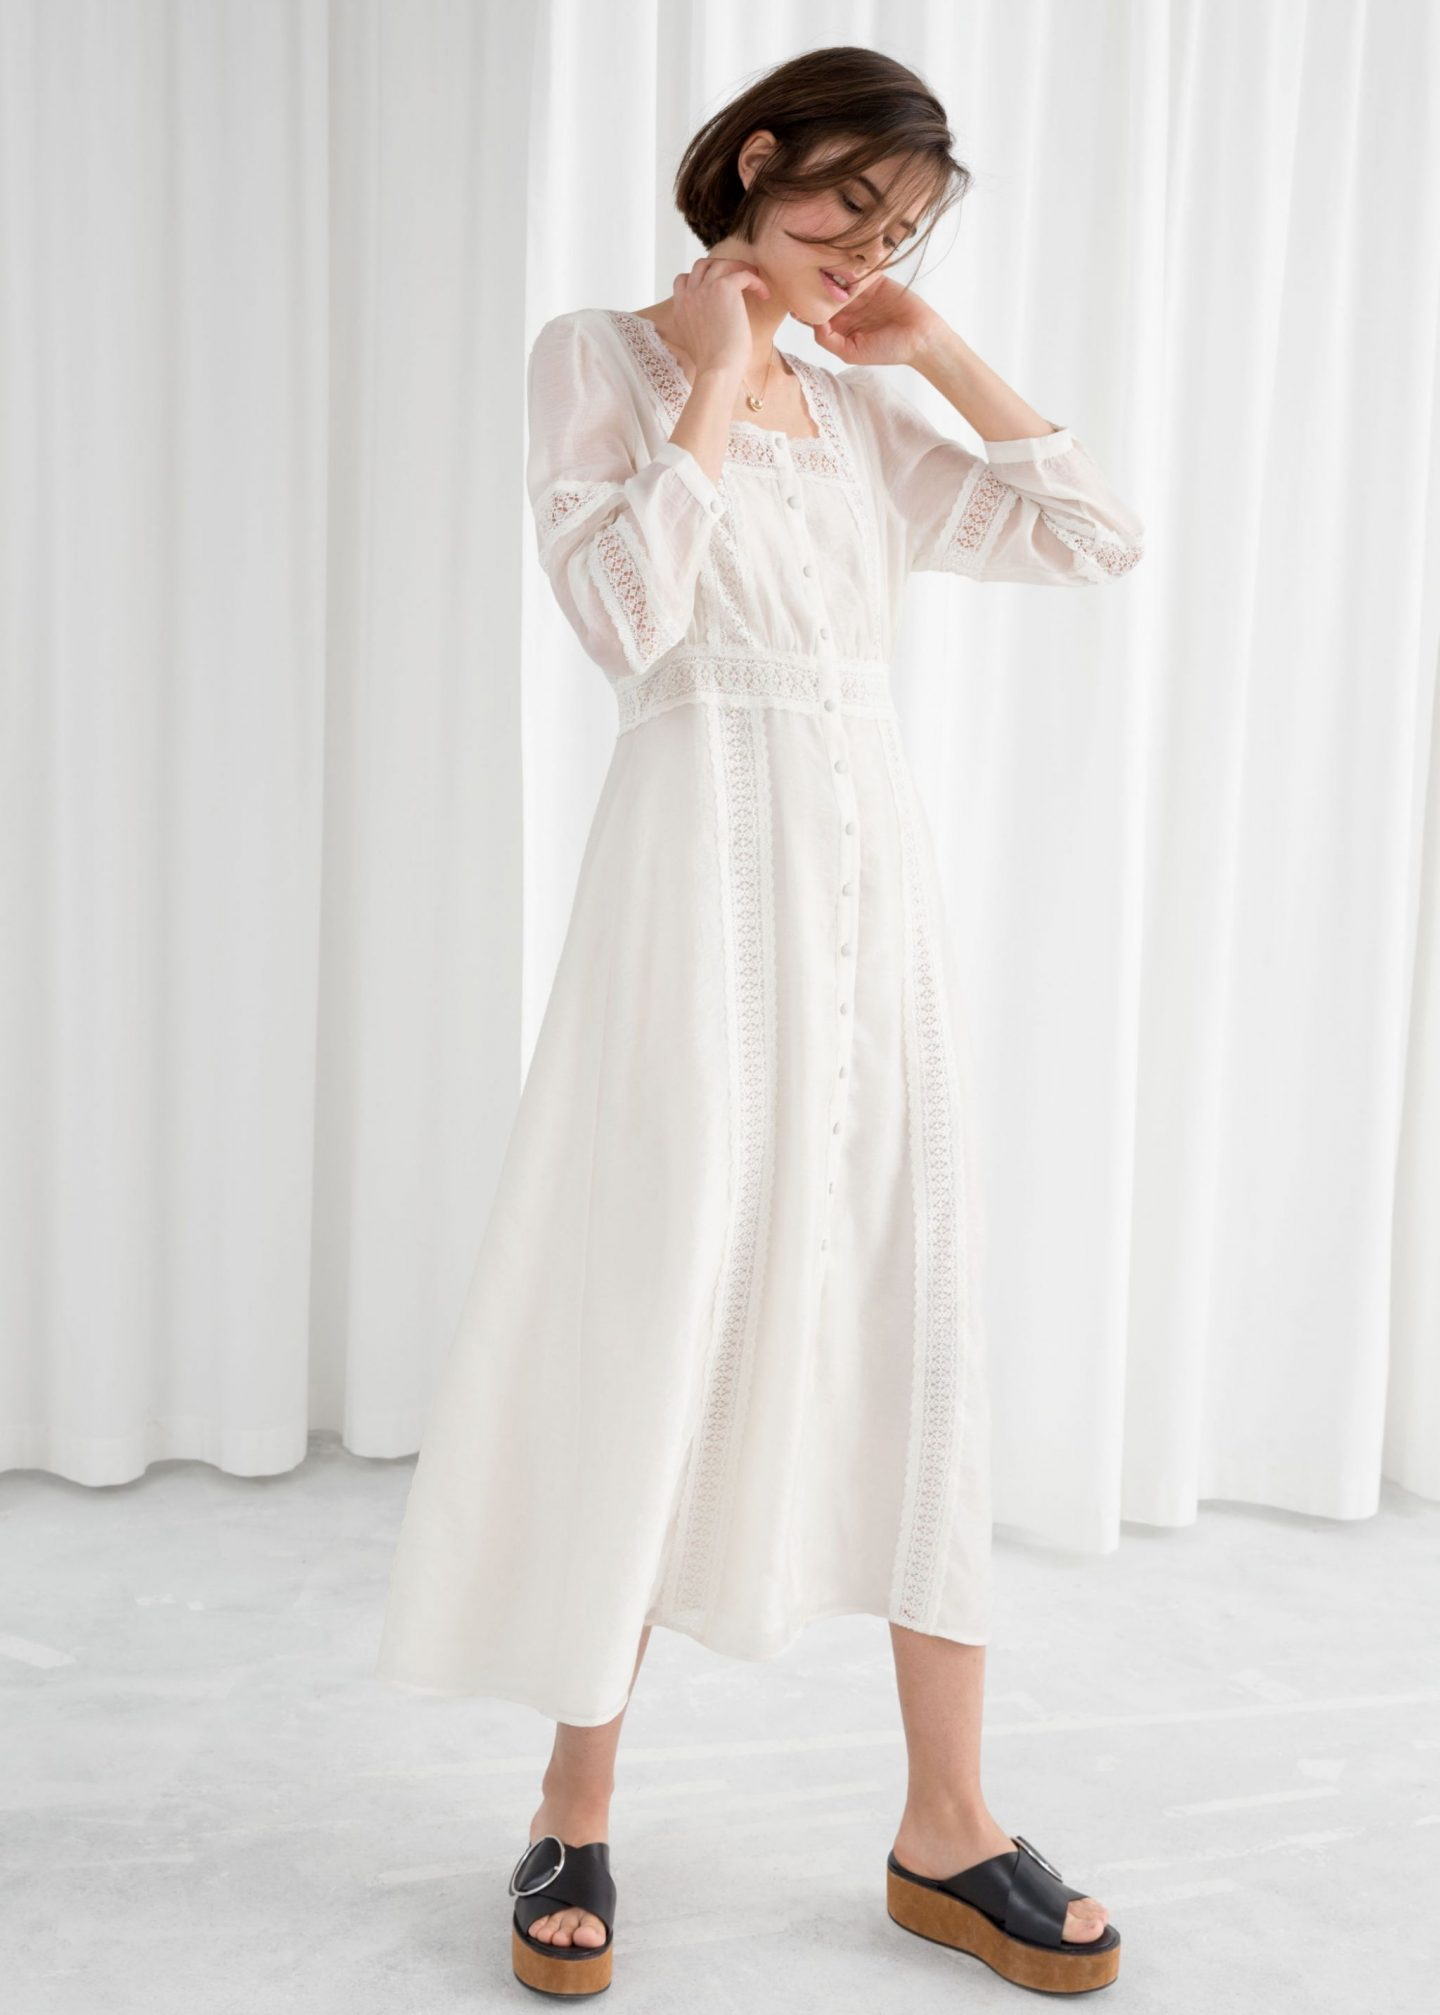 https://www.stories.com/en_eur/clothing/dresses/product.lace-midi-dress-white.0656822001.html